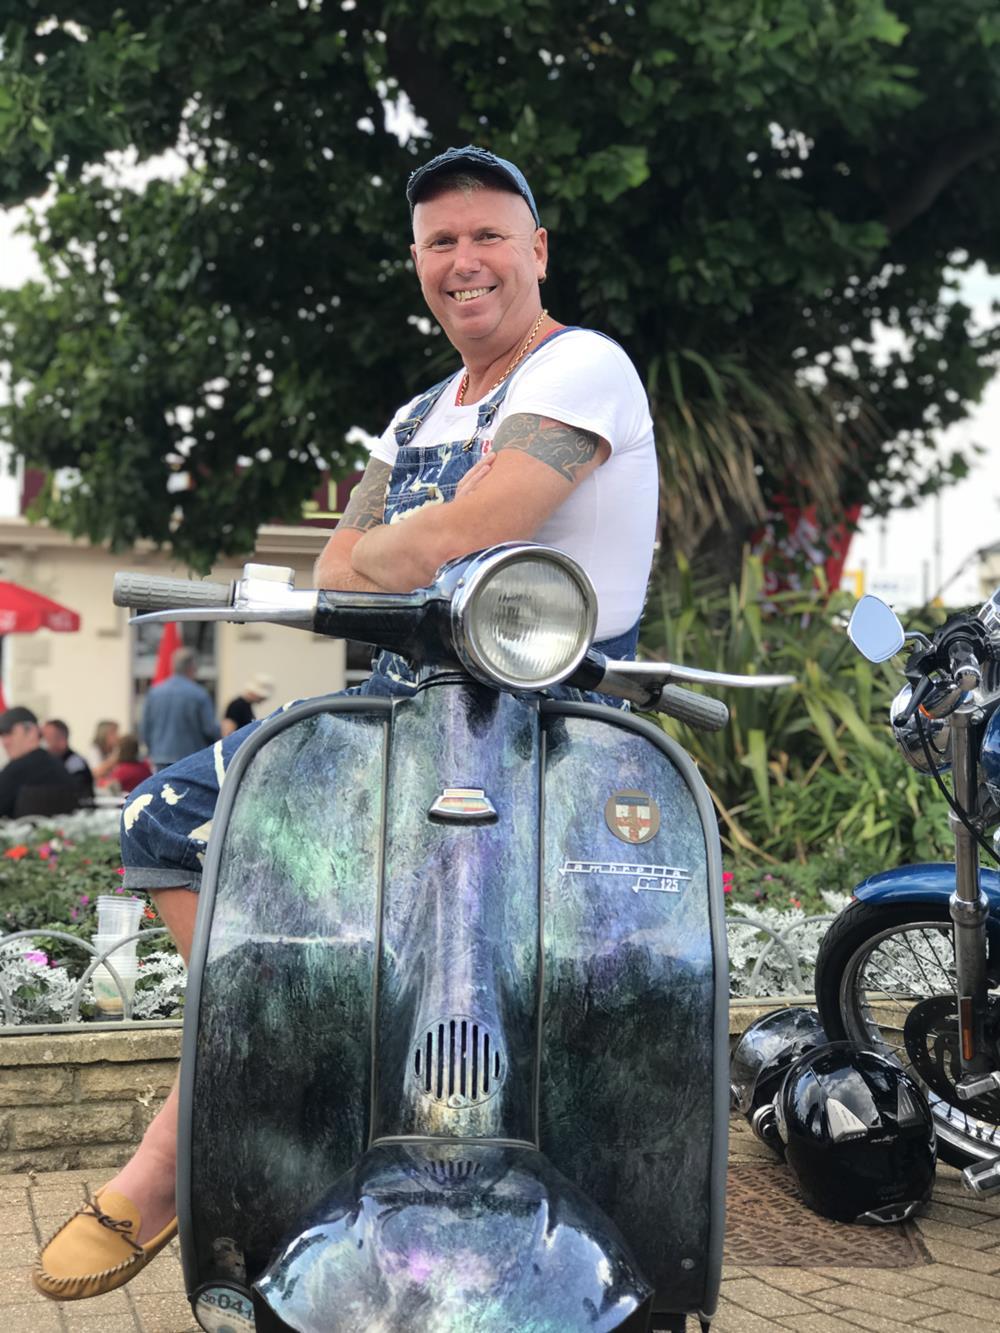 Gary Brice on custom Lambretta LI scooter